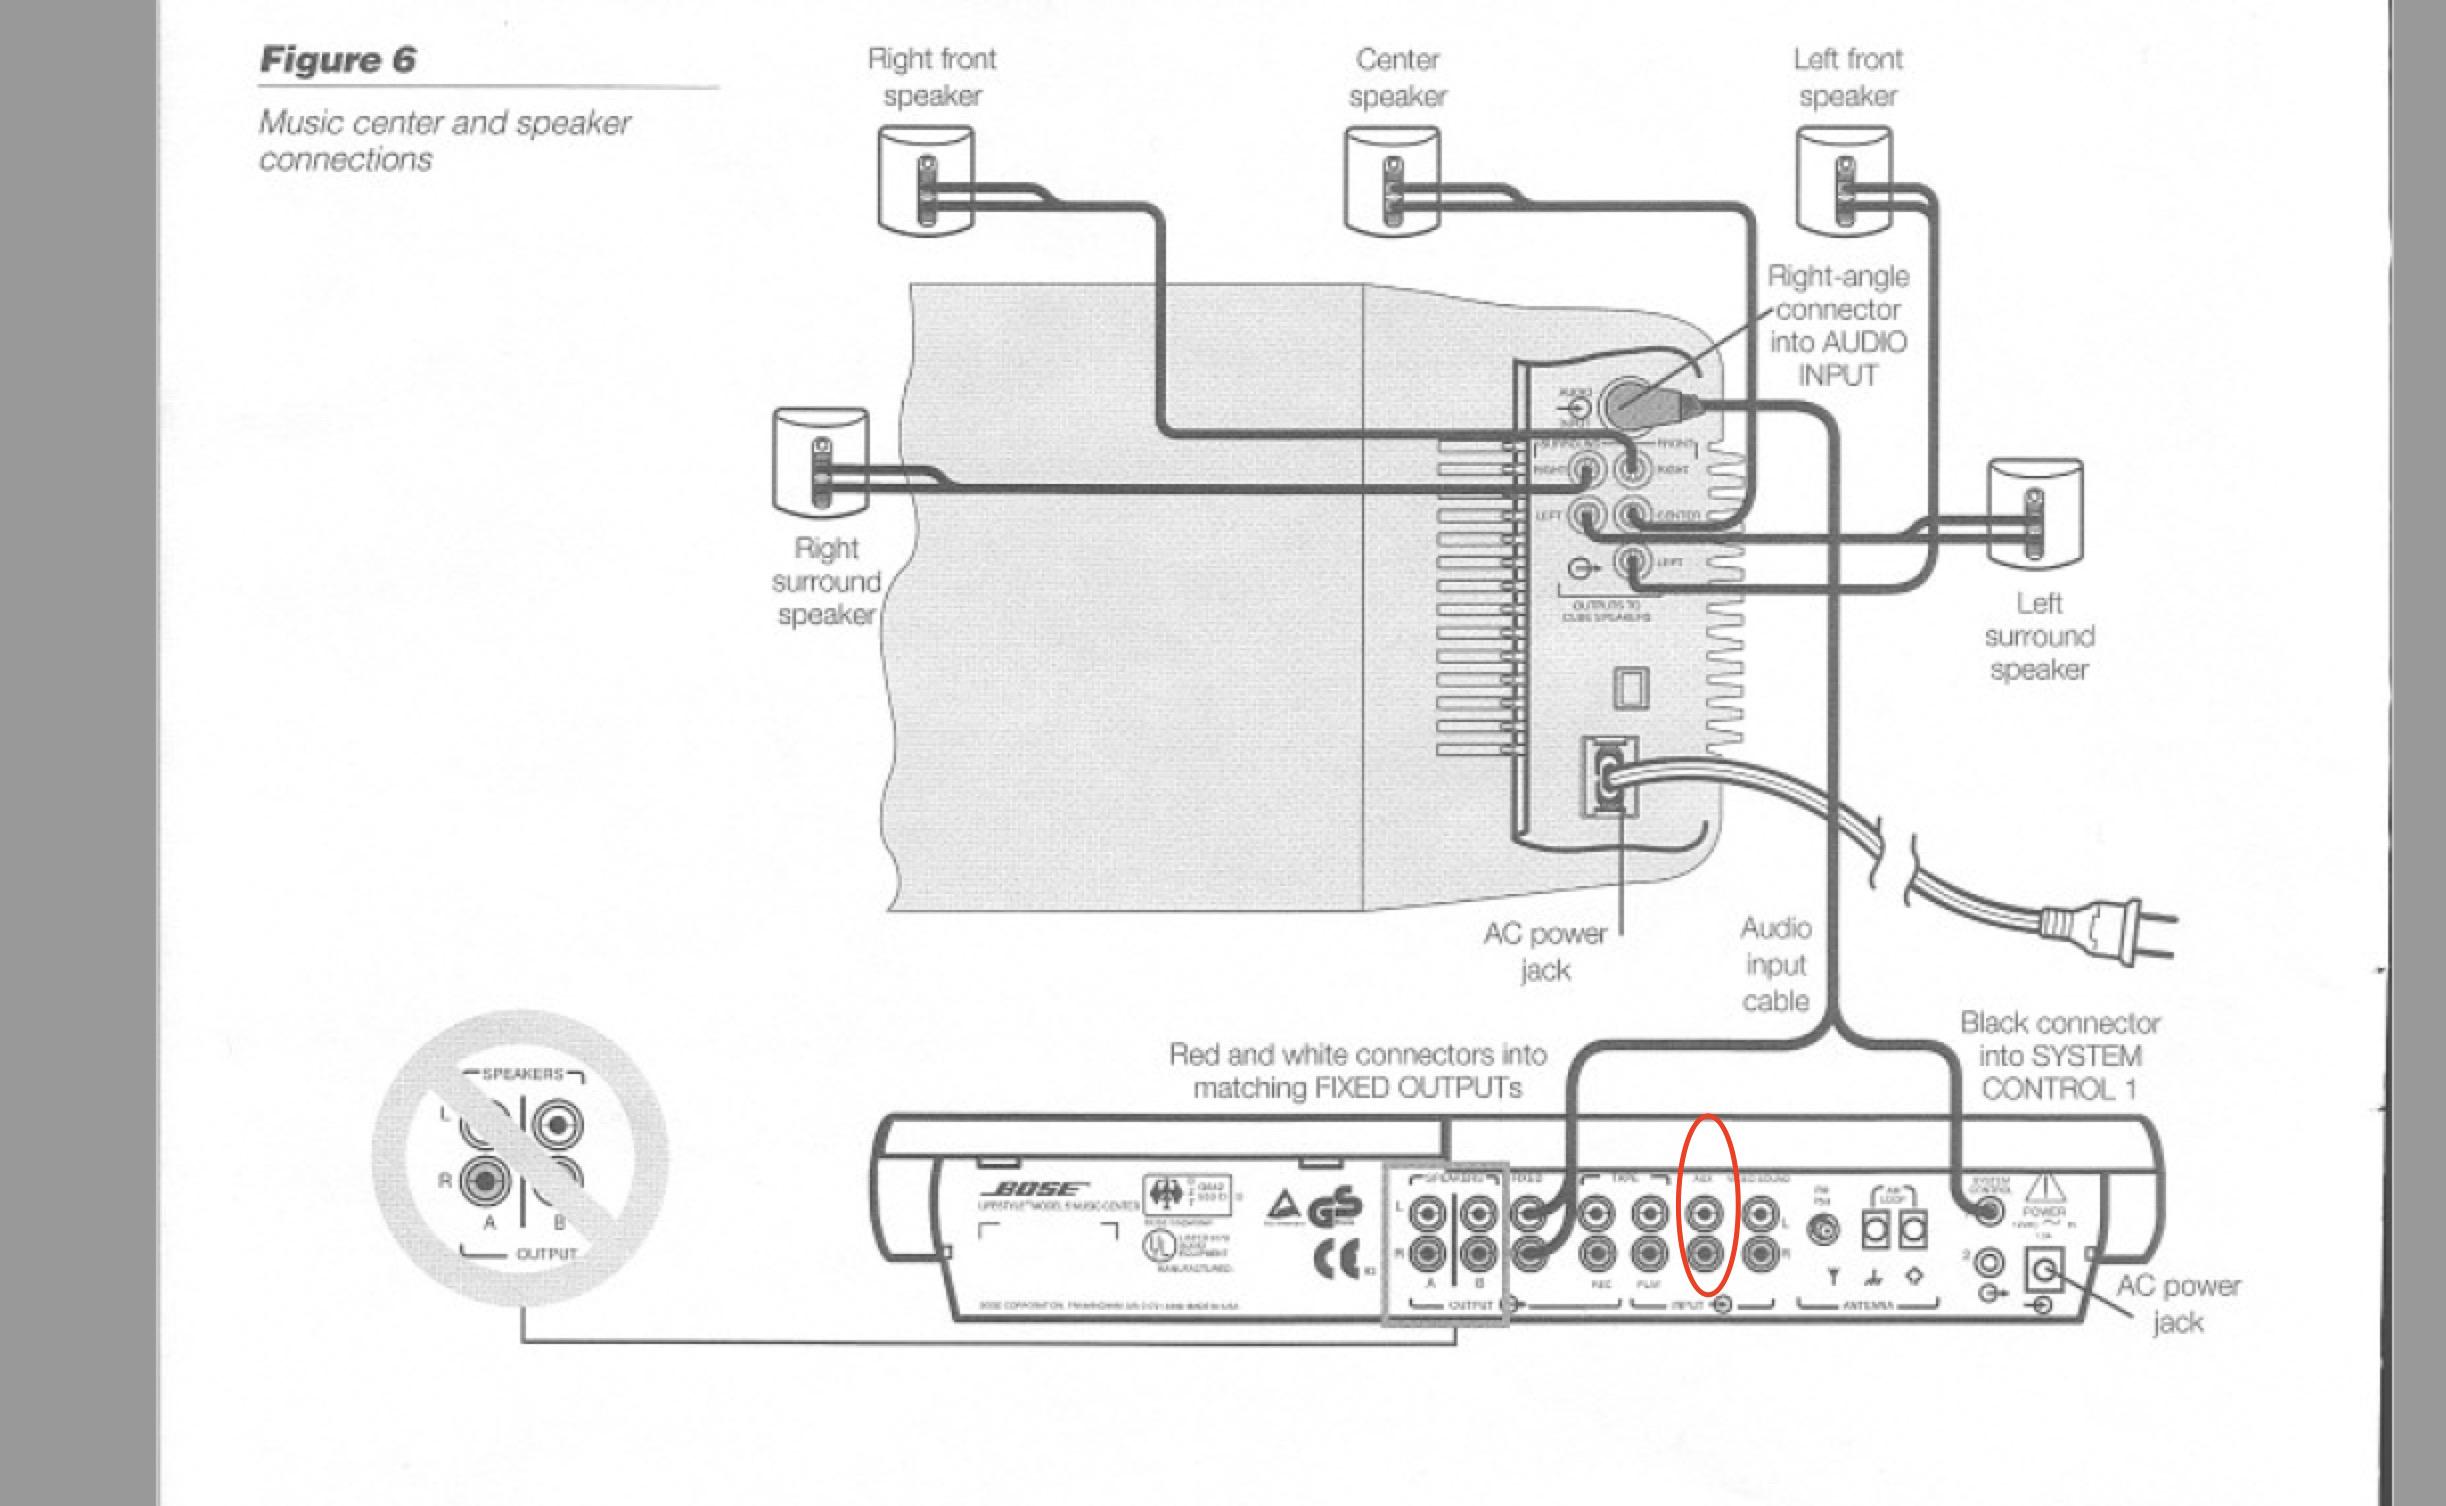 [DIAGRAM_4FR]  Connect Apple TV 4 to Bose home theater | MacRumors Forums | Bose 321 Hdmi Wiring Diagram |  | MacRumors Forums